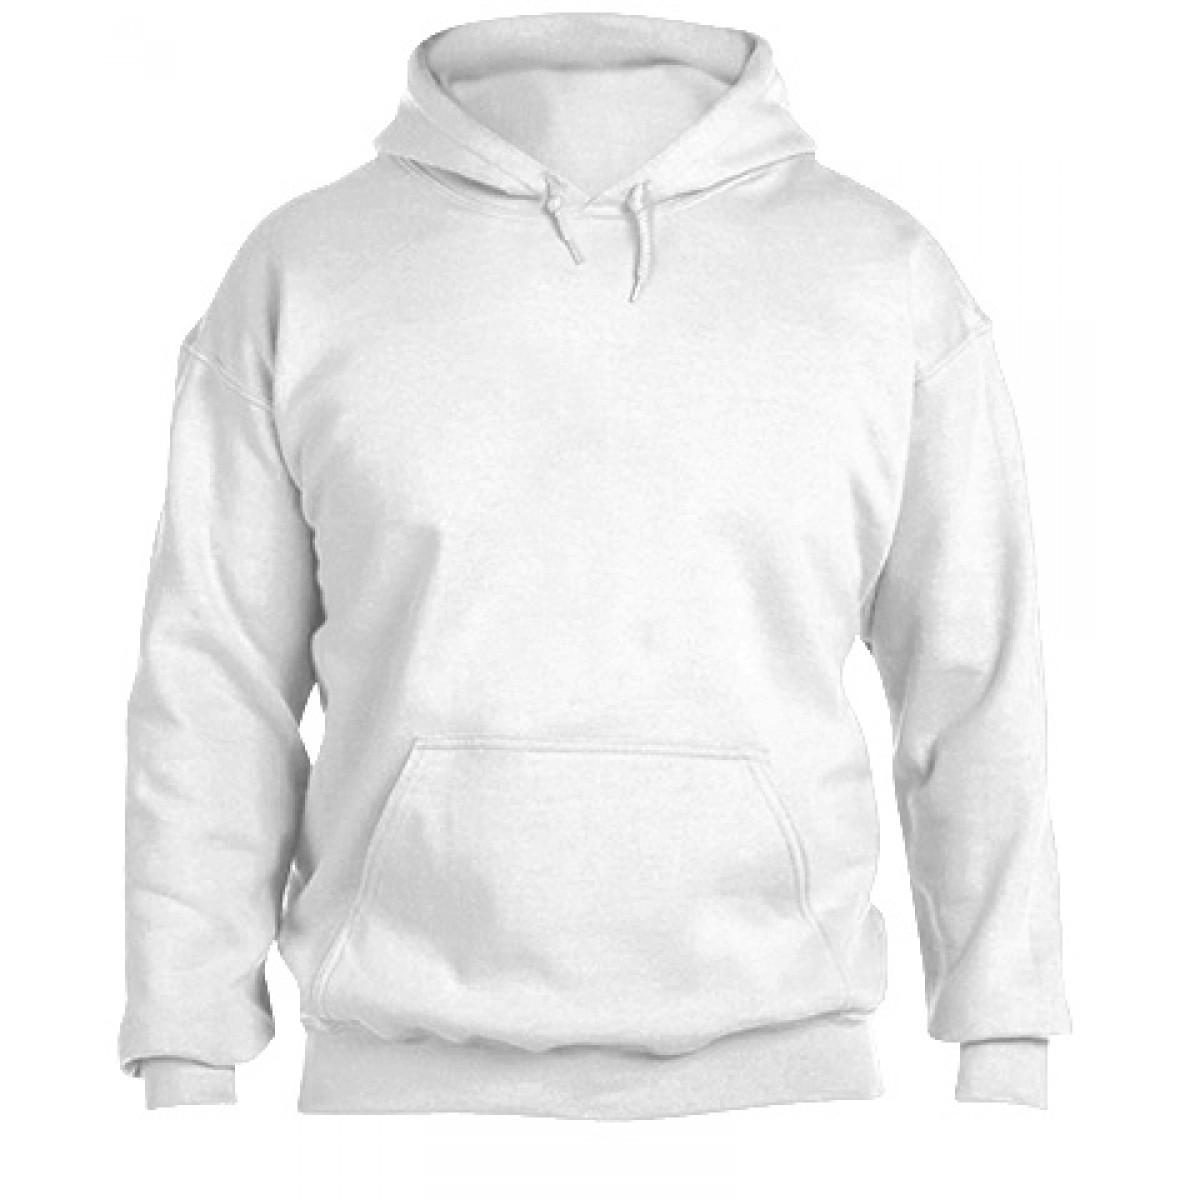 Hooded Sweatshirt 50/50 Heavy Blend-White-XL